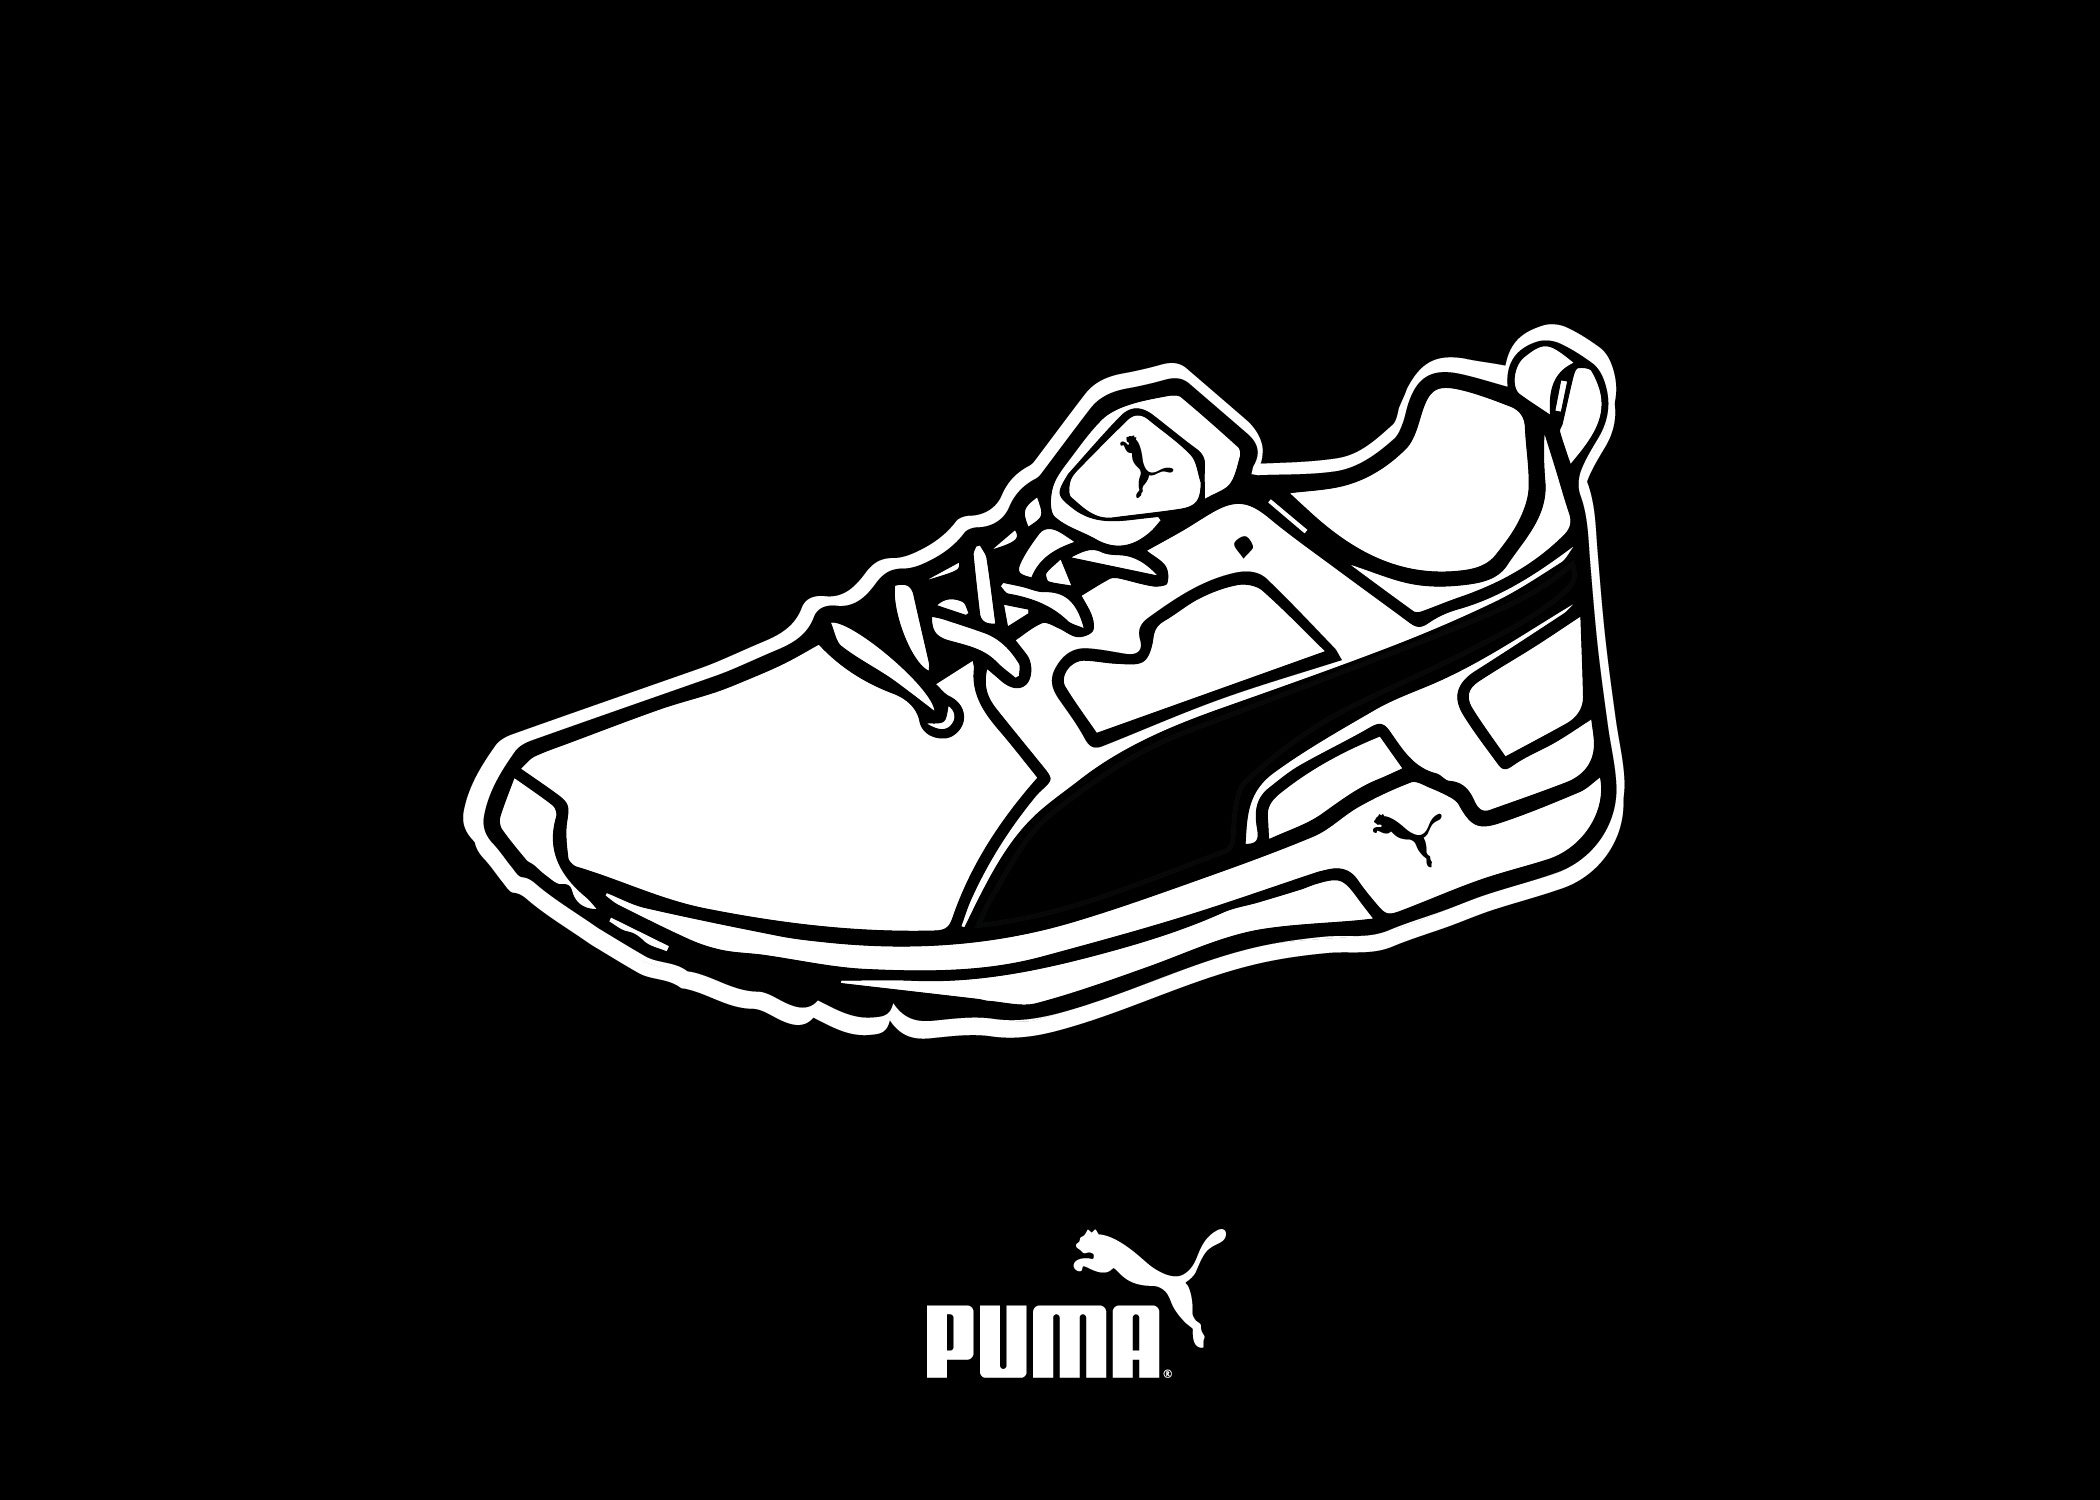 PUMA-1135_No-go_SeedingCards_PR-Social_7x5-04.jpg